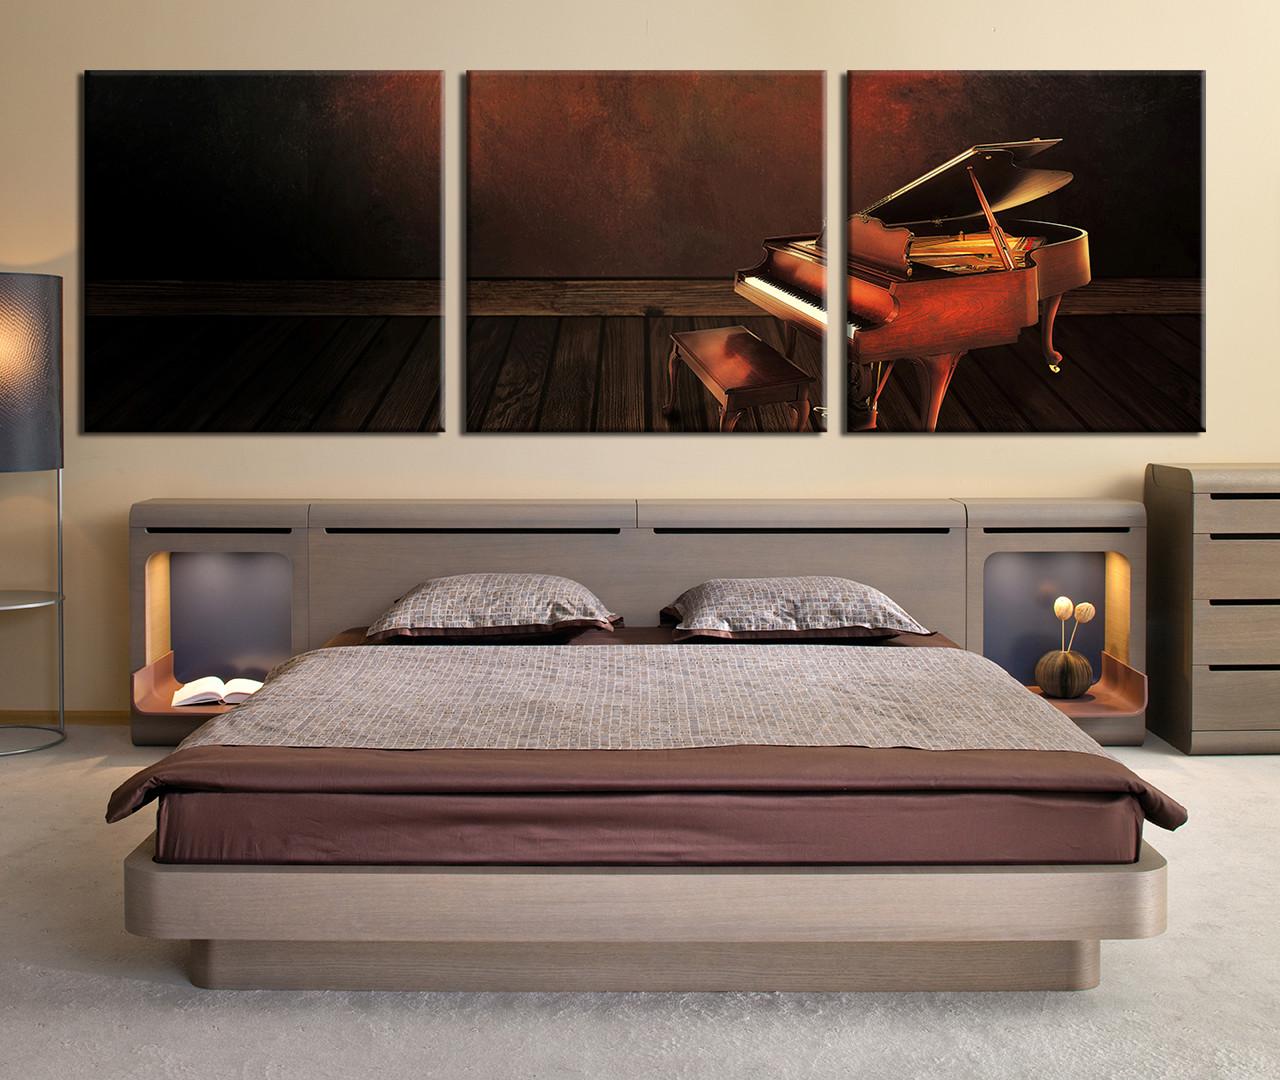 Perfect Bedroom Decor, 3 Piece Wall Art, Music Canvas Art Prints, Piano Multi Panel Part 16